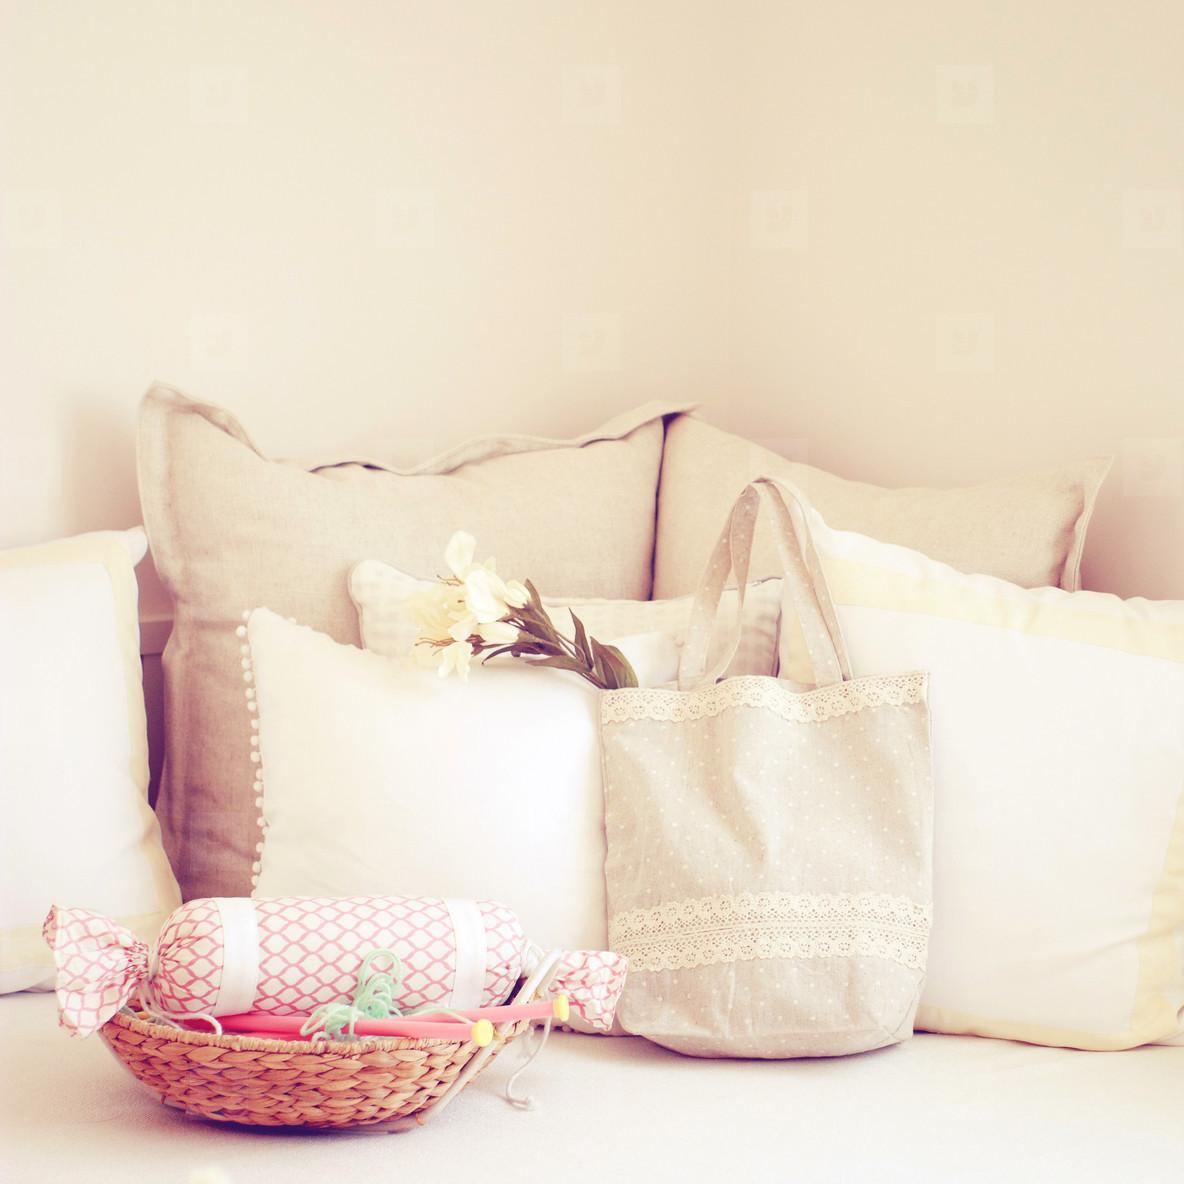 Knitting needles in basket